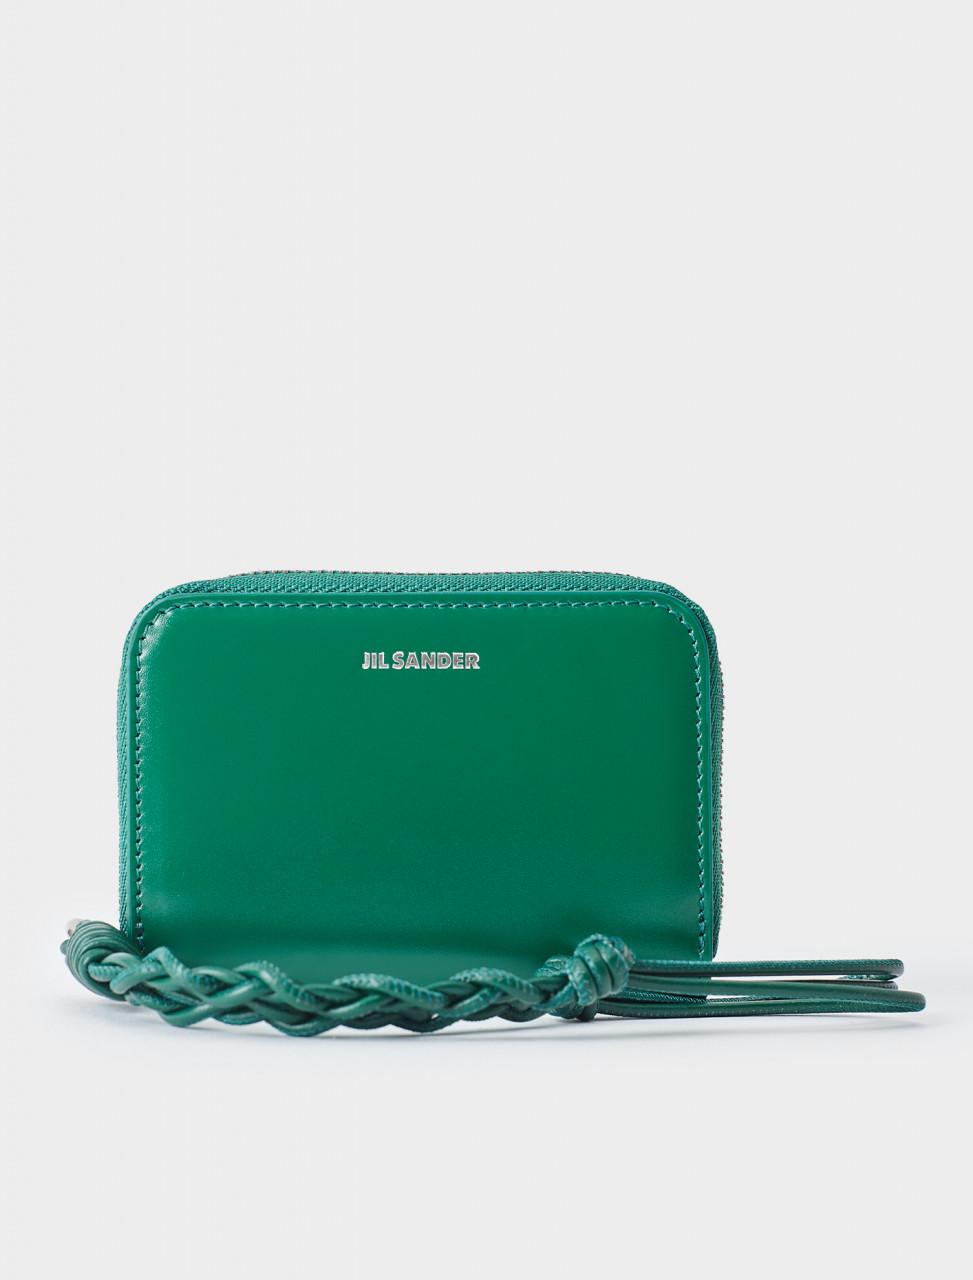 130-JSPR840053-WRS69146N-320 Jil Sander Small Zip Around Wallet in Bright Green